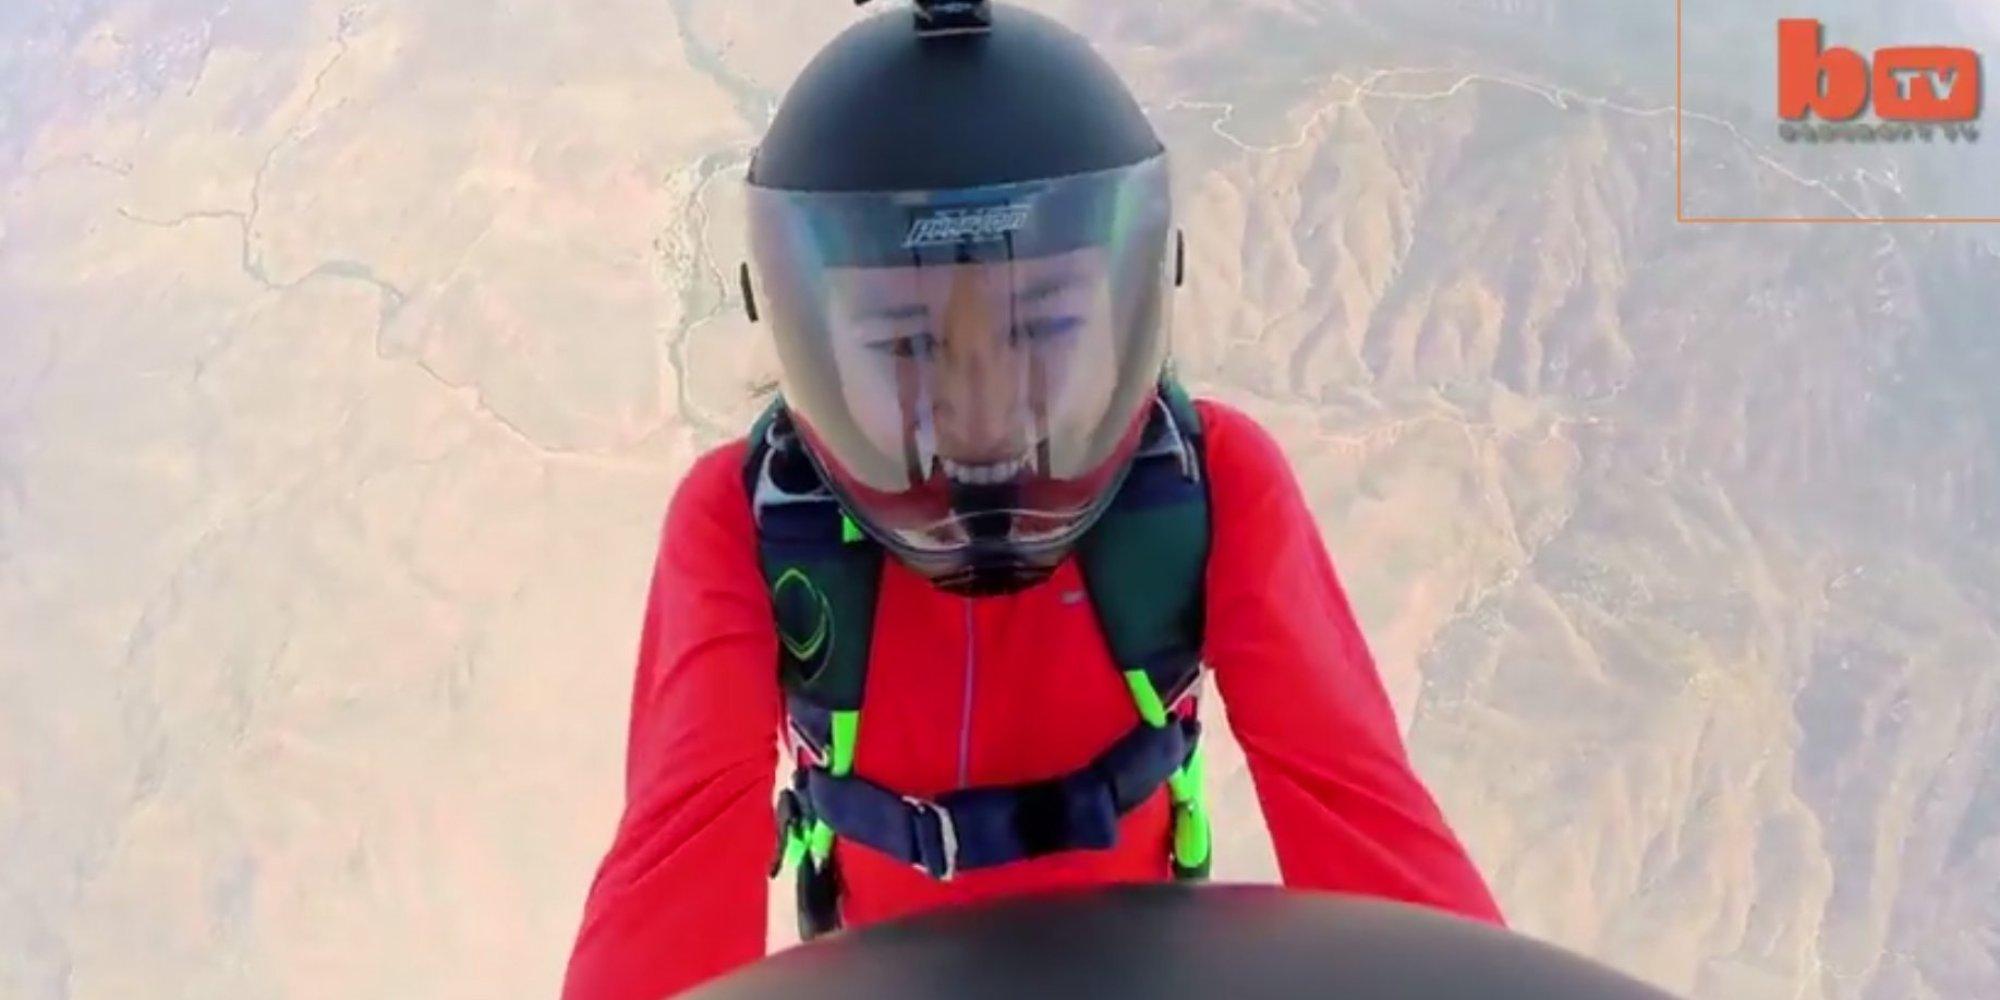 Skydiving Proposal Drops Ring